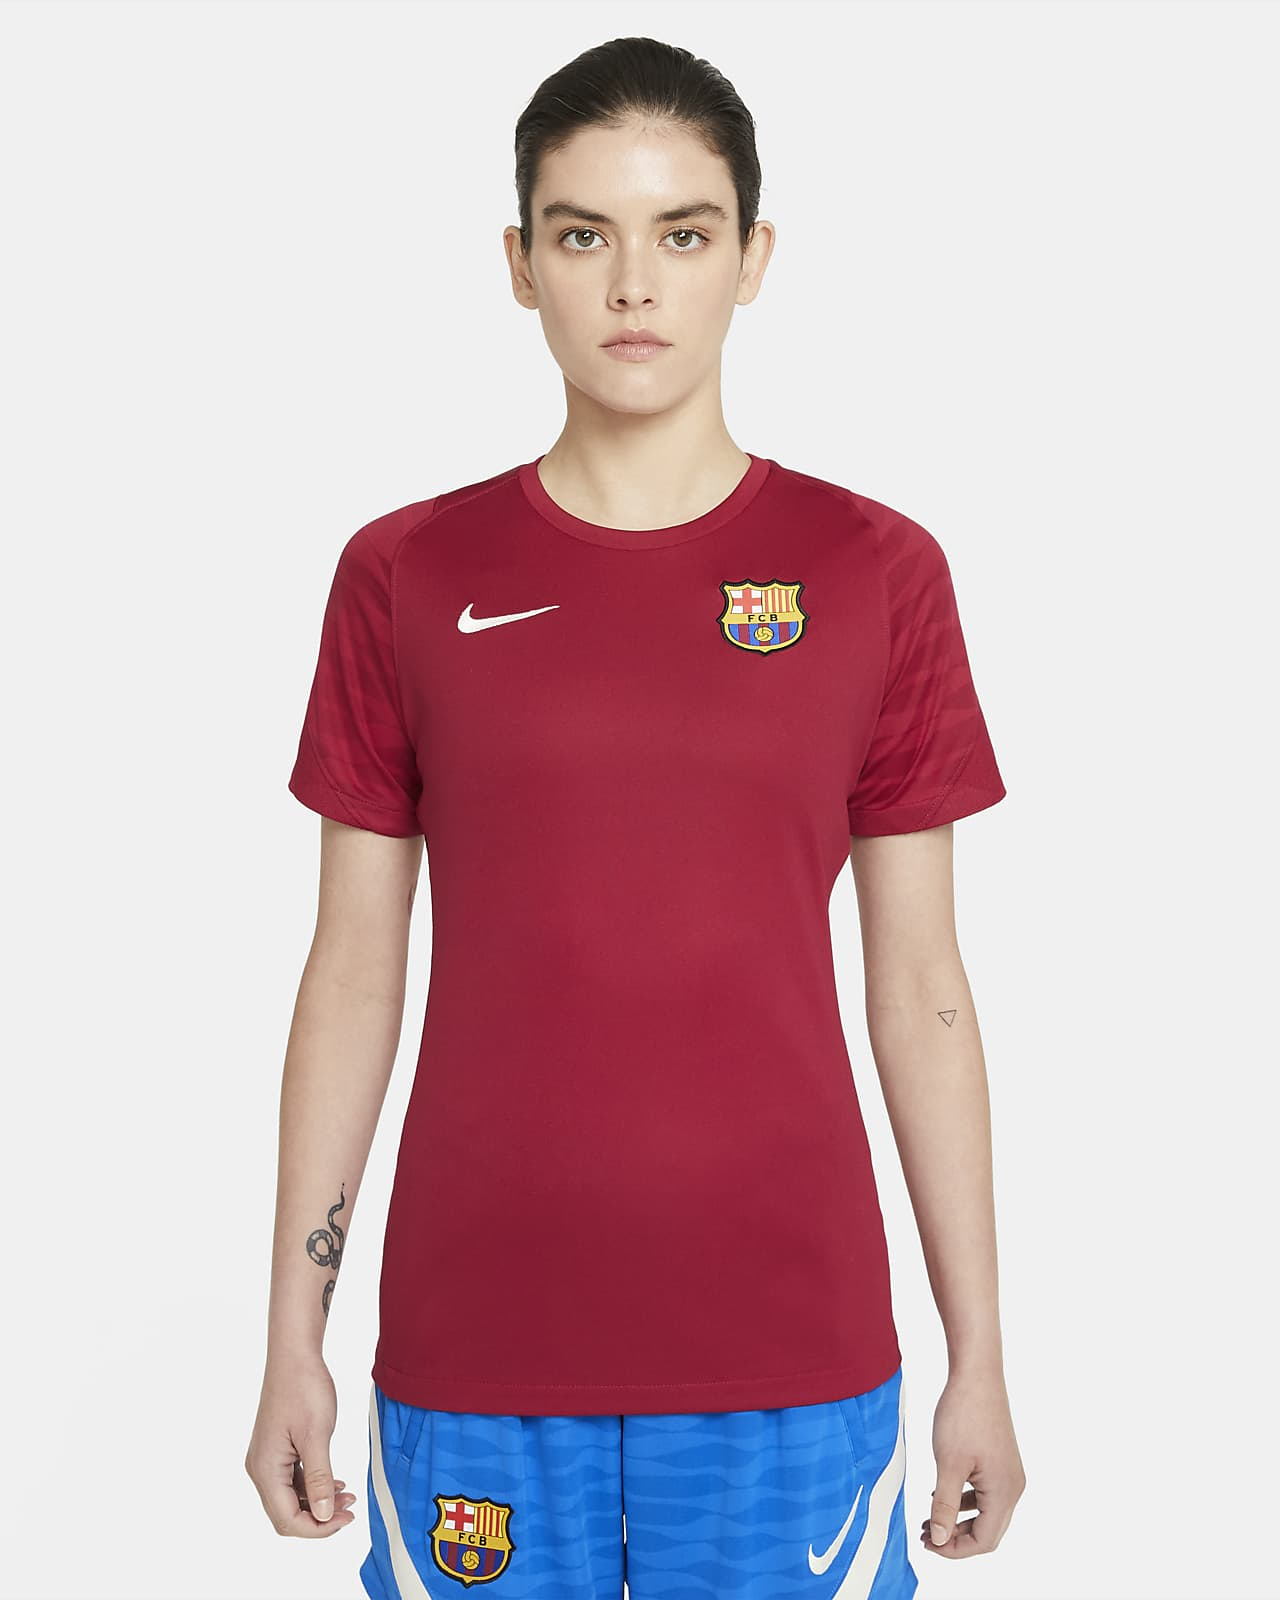 Prenda para la parte superior de fútbol de manga corta Nike Dri-FIT para mujer FC Barcelona Strike